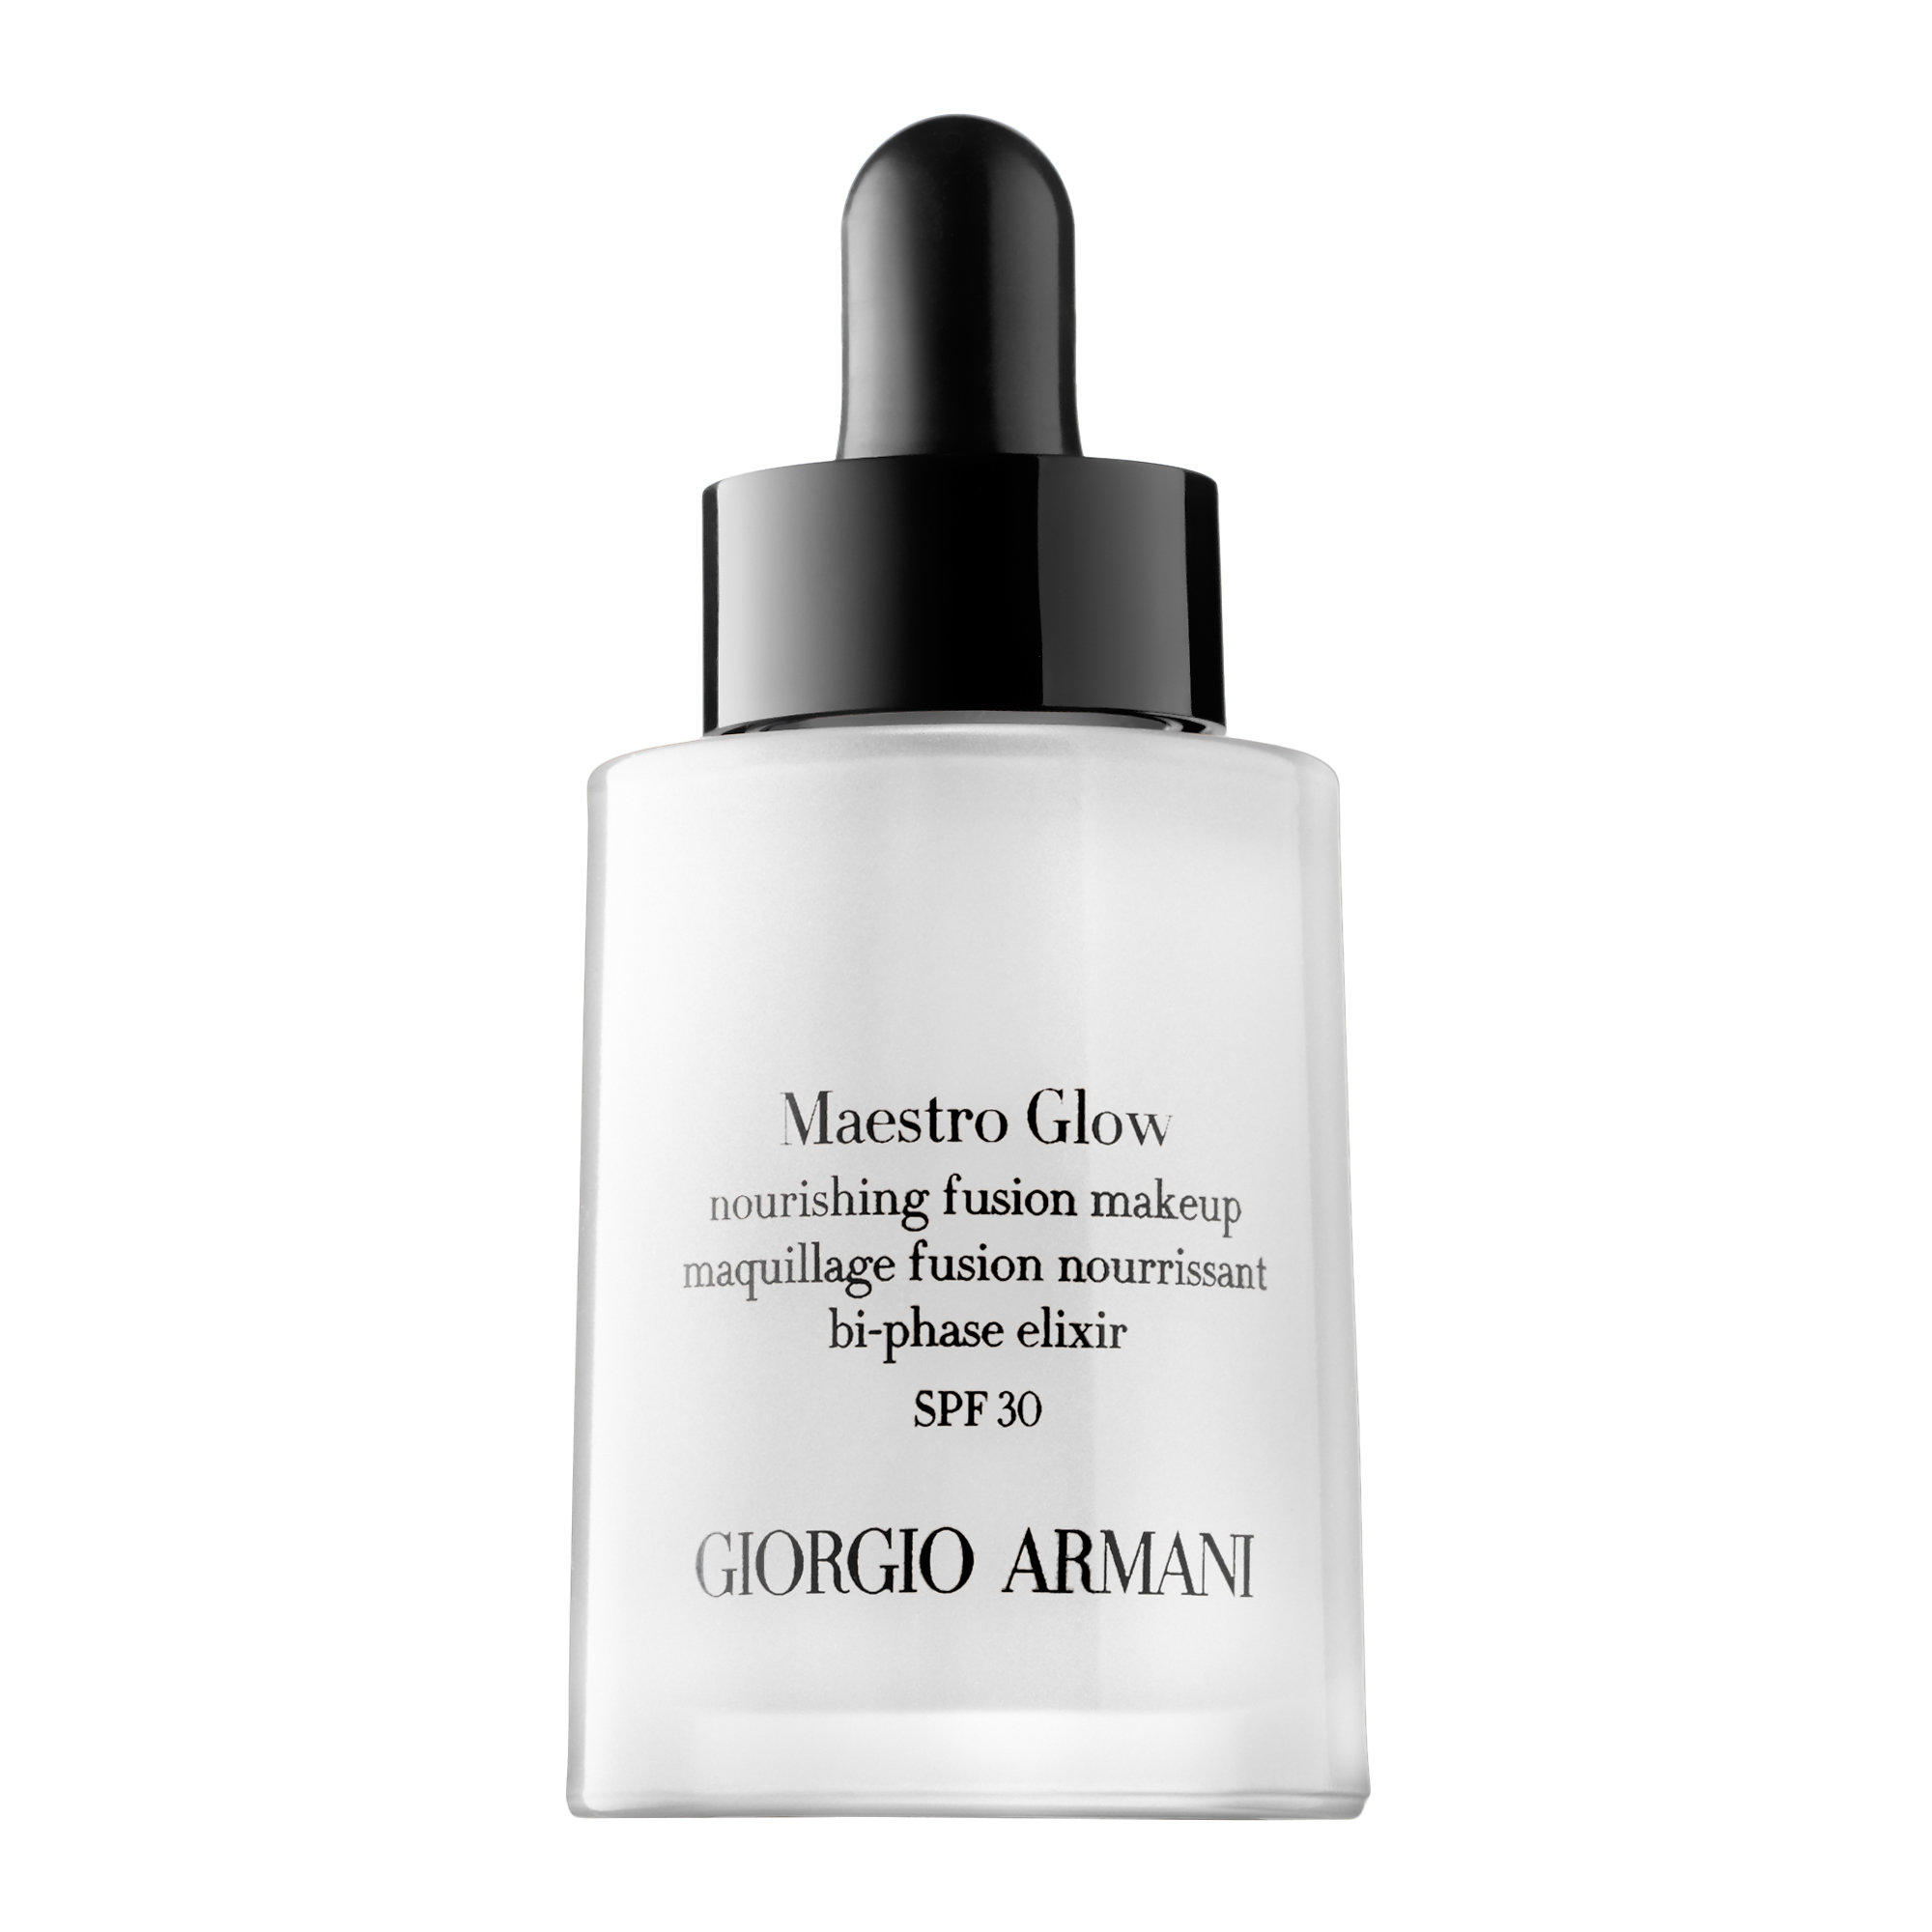 Giorgio Armani Maestro Glow Nourishing Fusion Makeup Bi